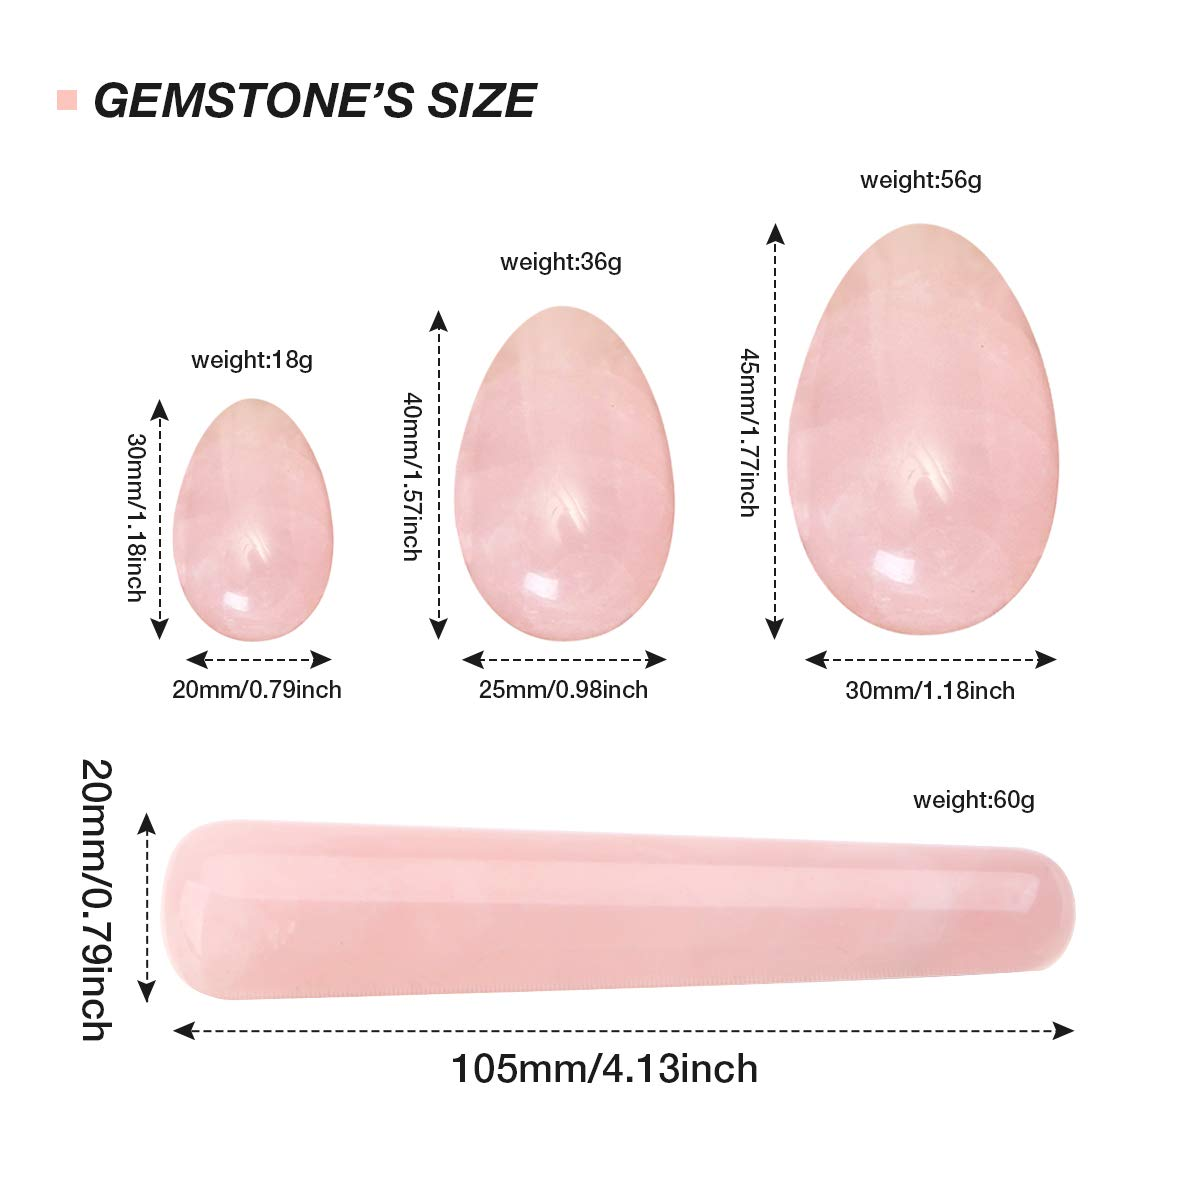 1/pcs Masaje Charminer 3/pcs perforado NATURAL cuarzo de cristal rosa Jade huevos Yoni huevos Stick para ejercicios 4/piezas Set